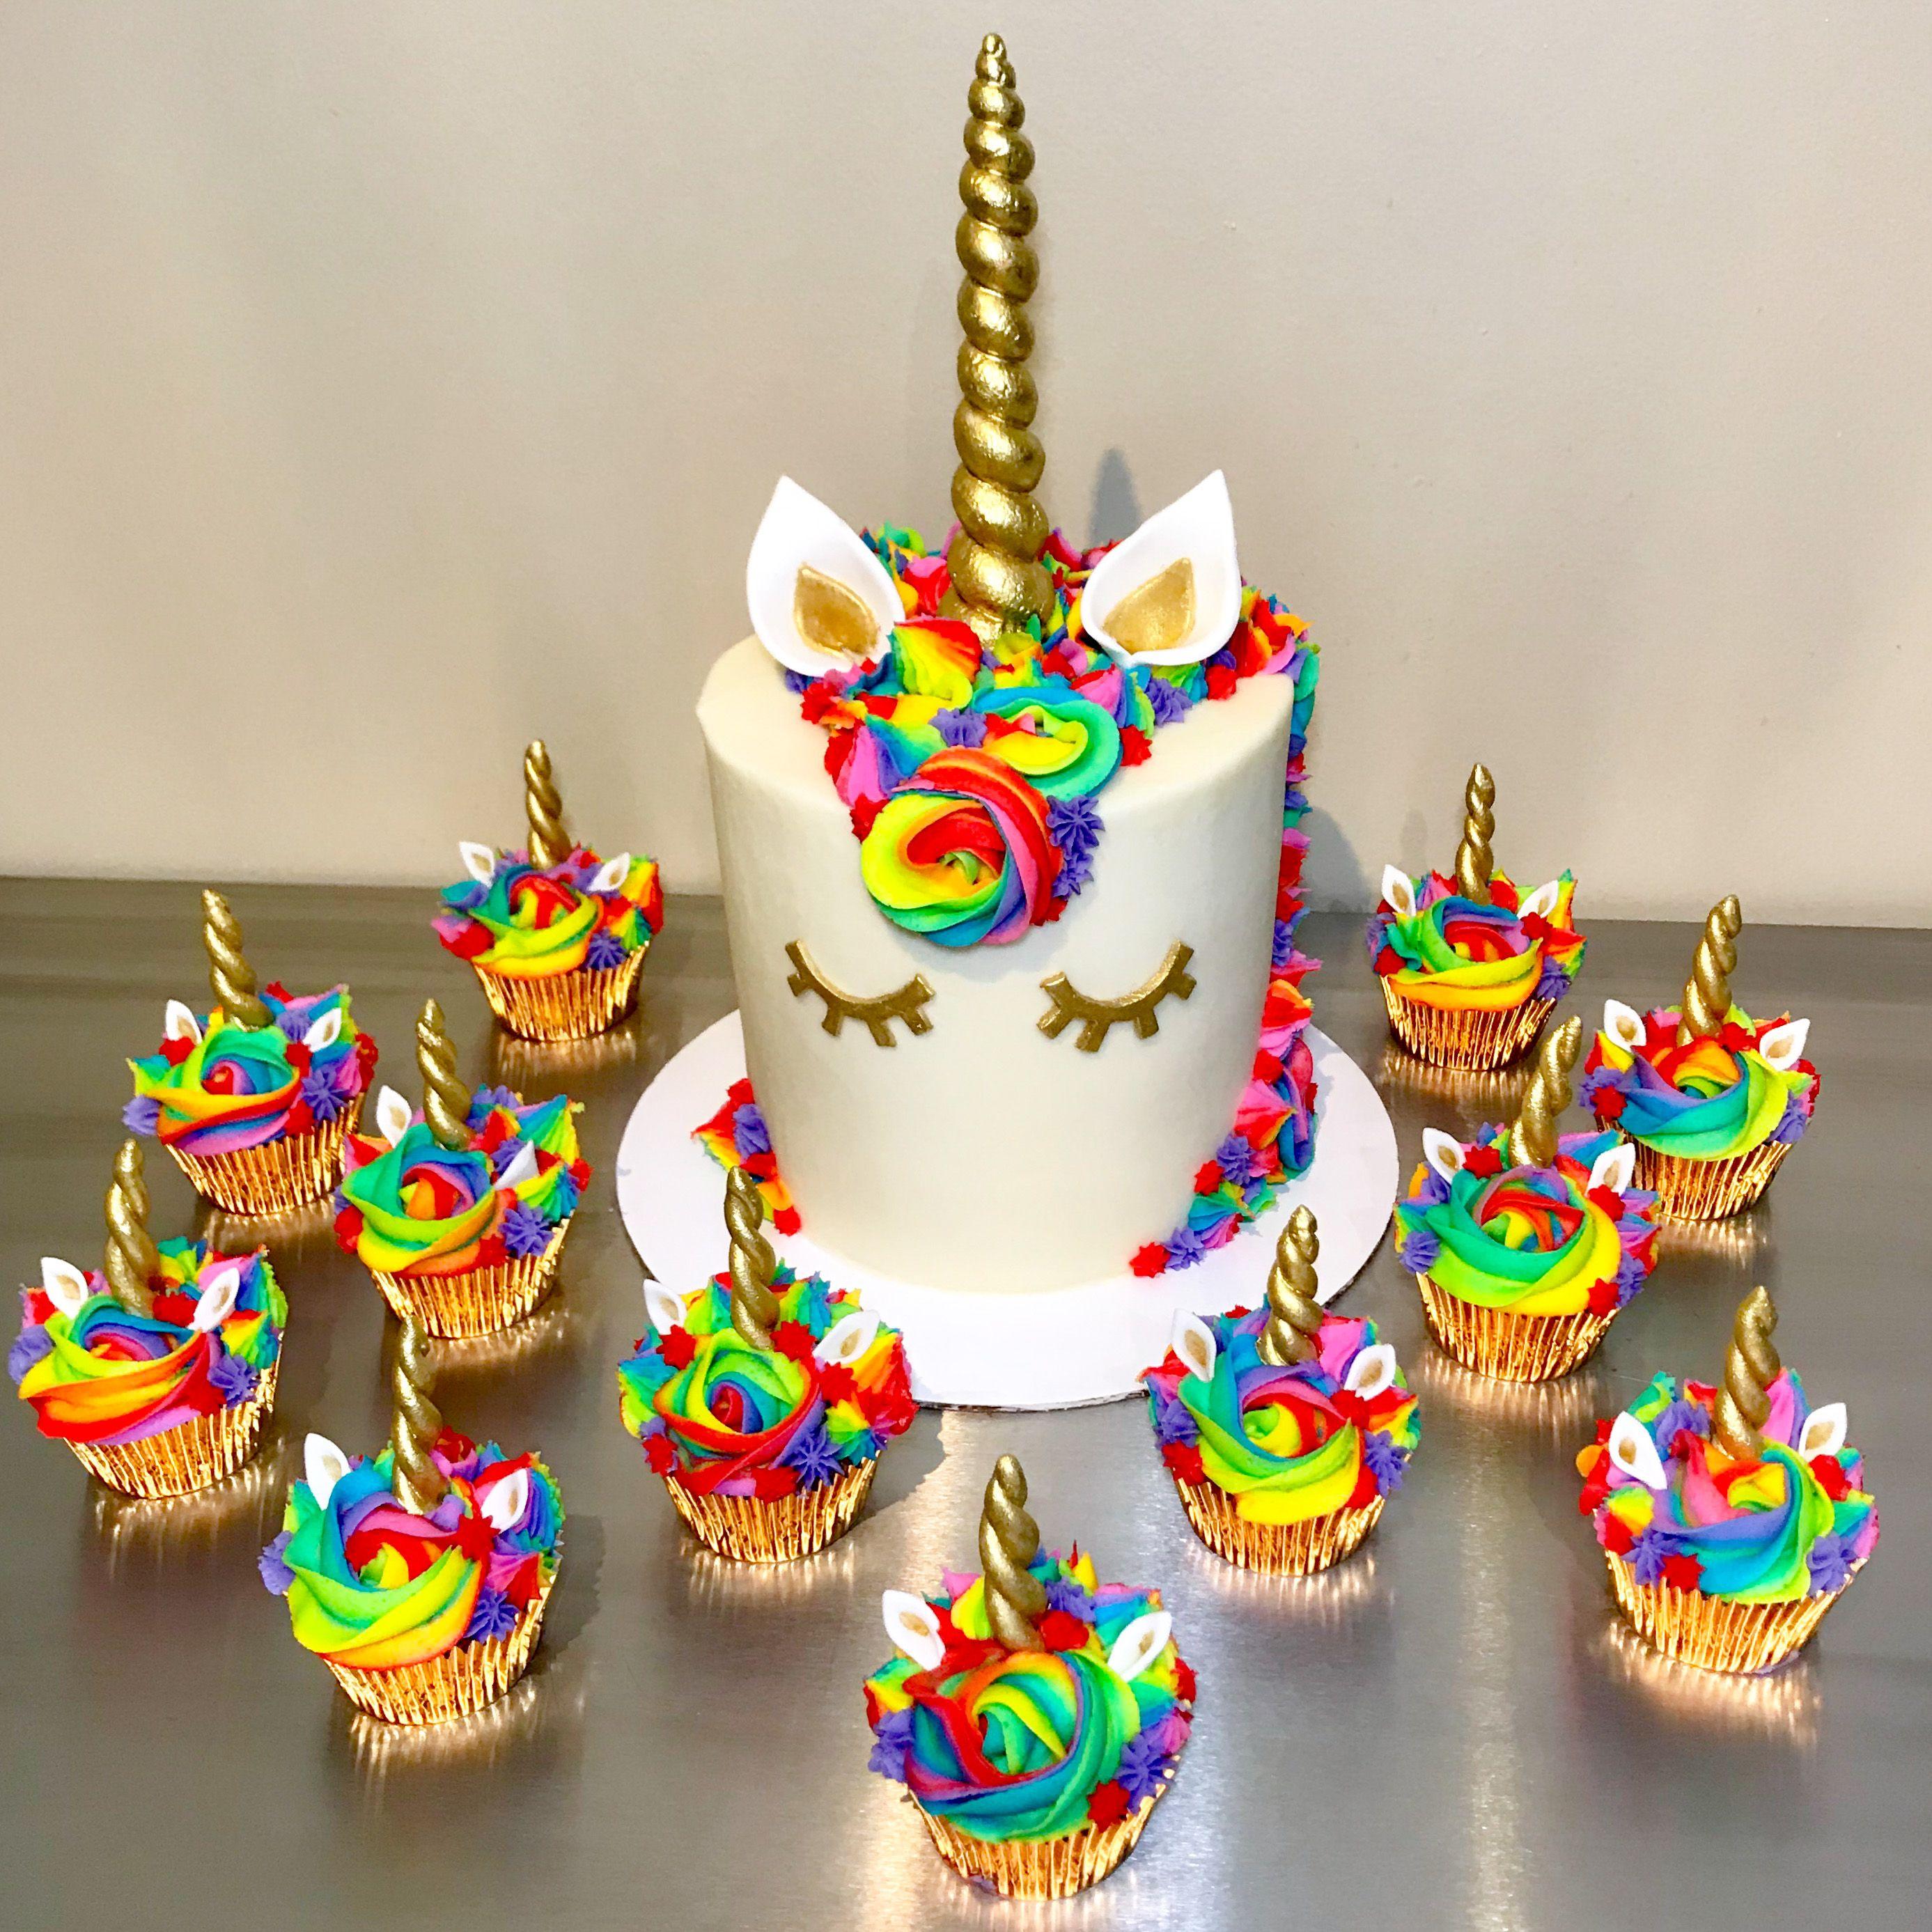 Rainbow Unicorn Cake And Cupcakes From Sakurabakingco